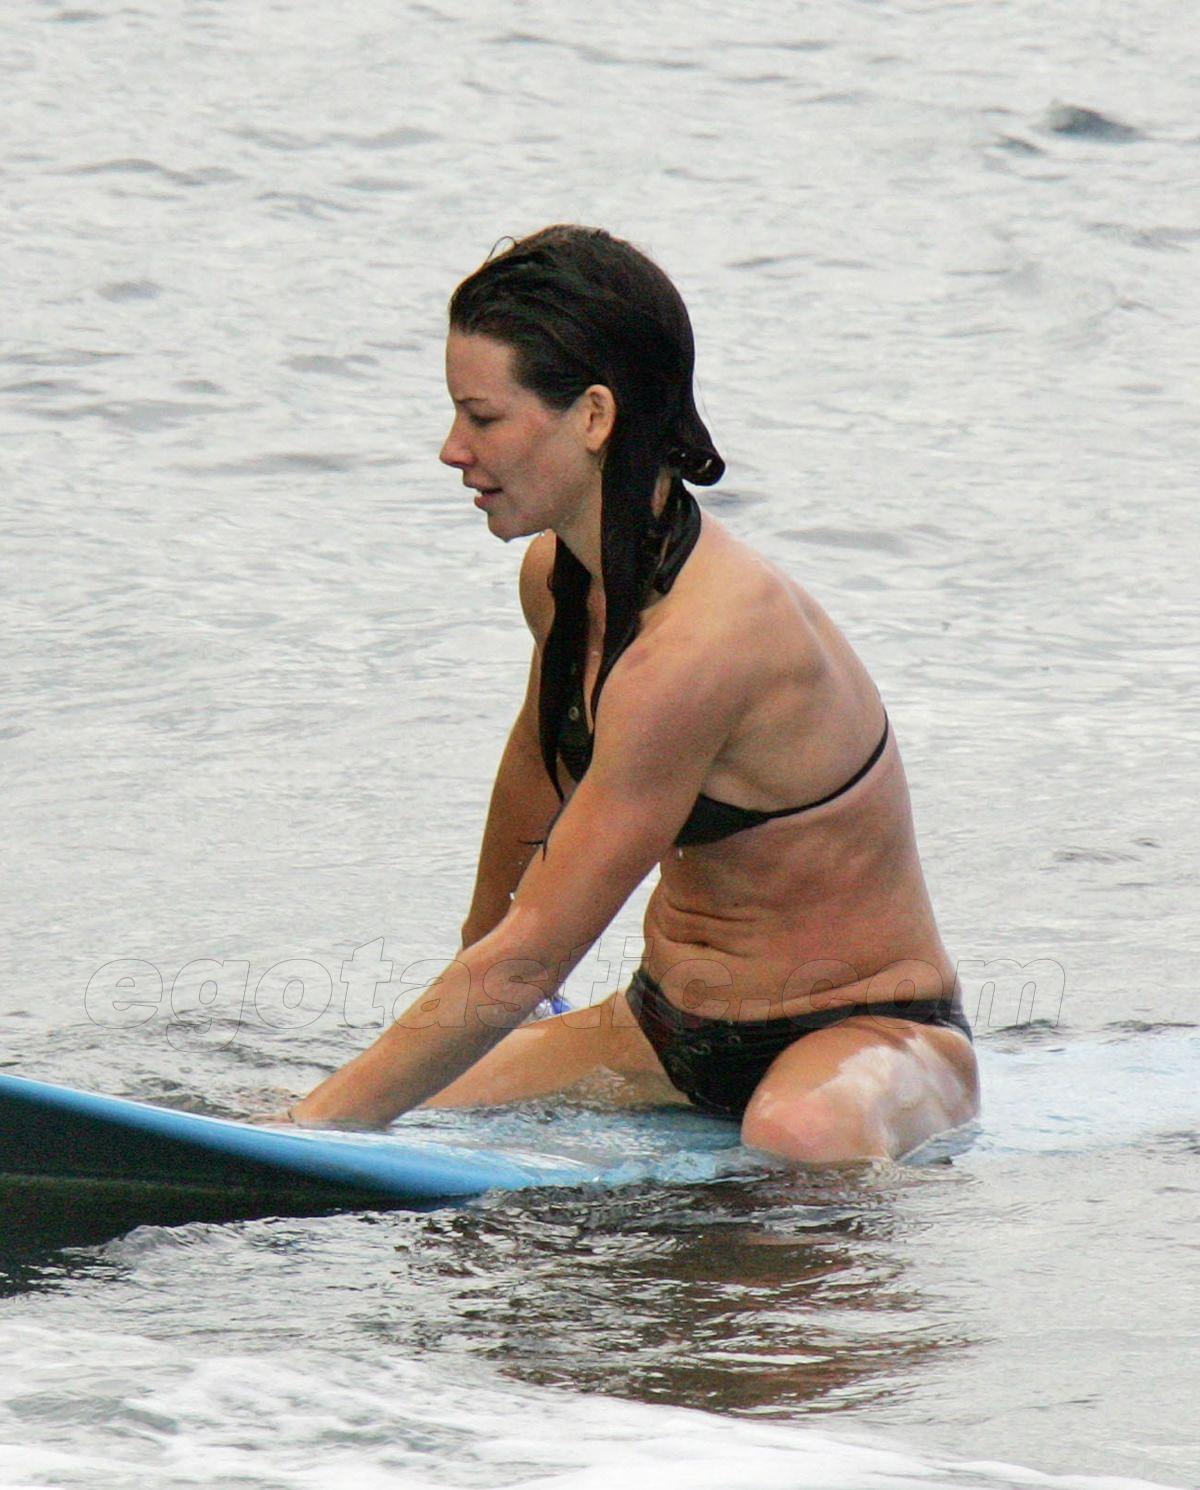 evangeline lilly hot bikini - photo #5